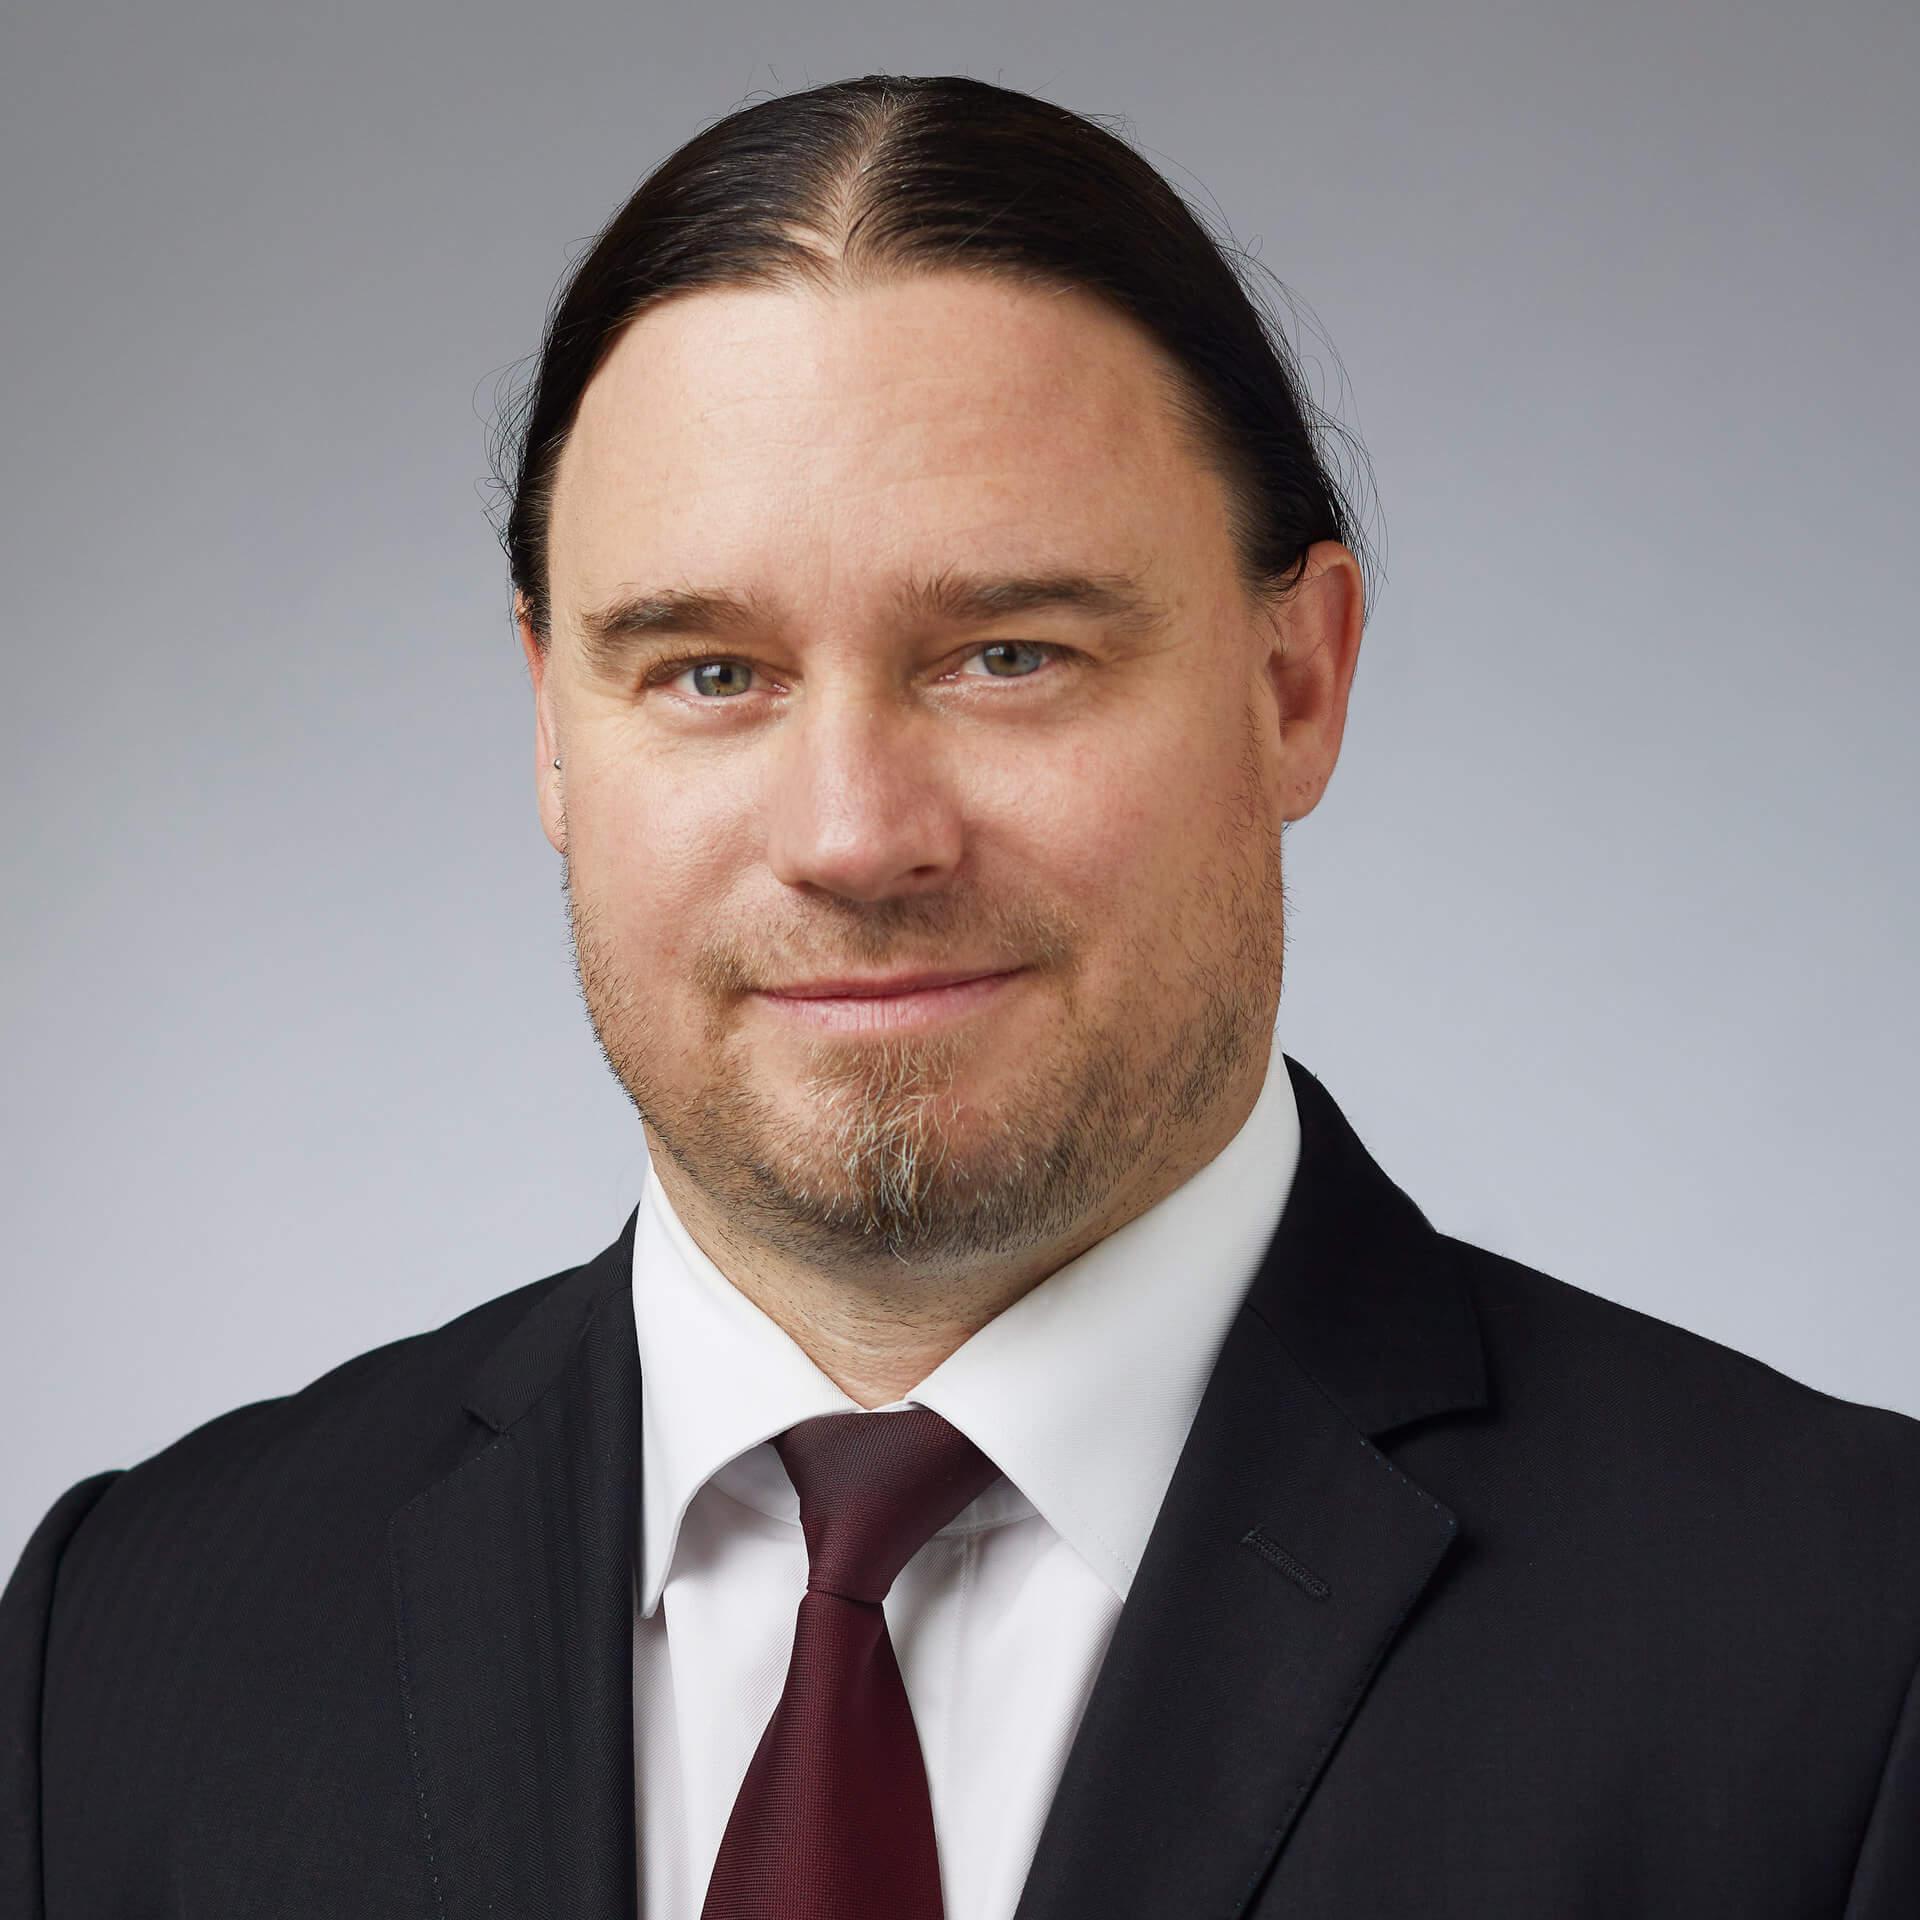 Daniel Loreck